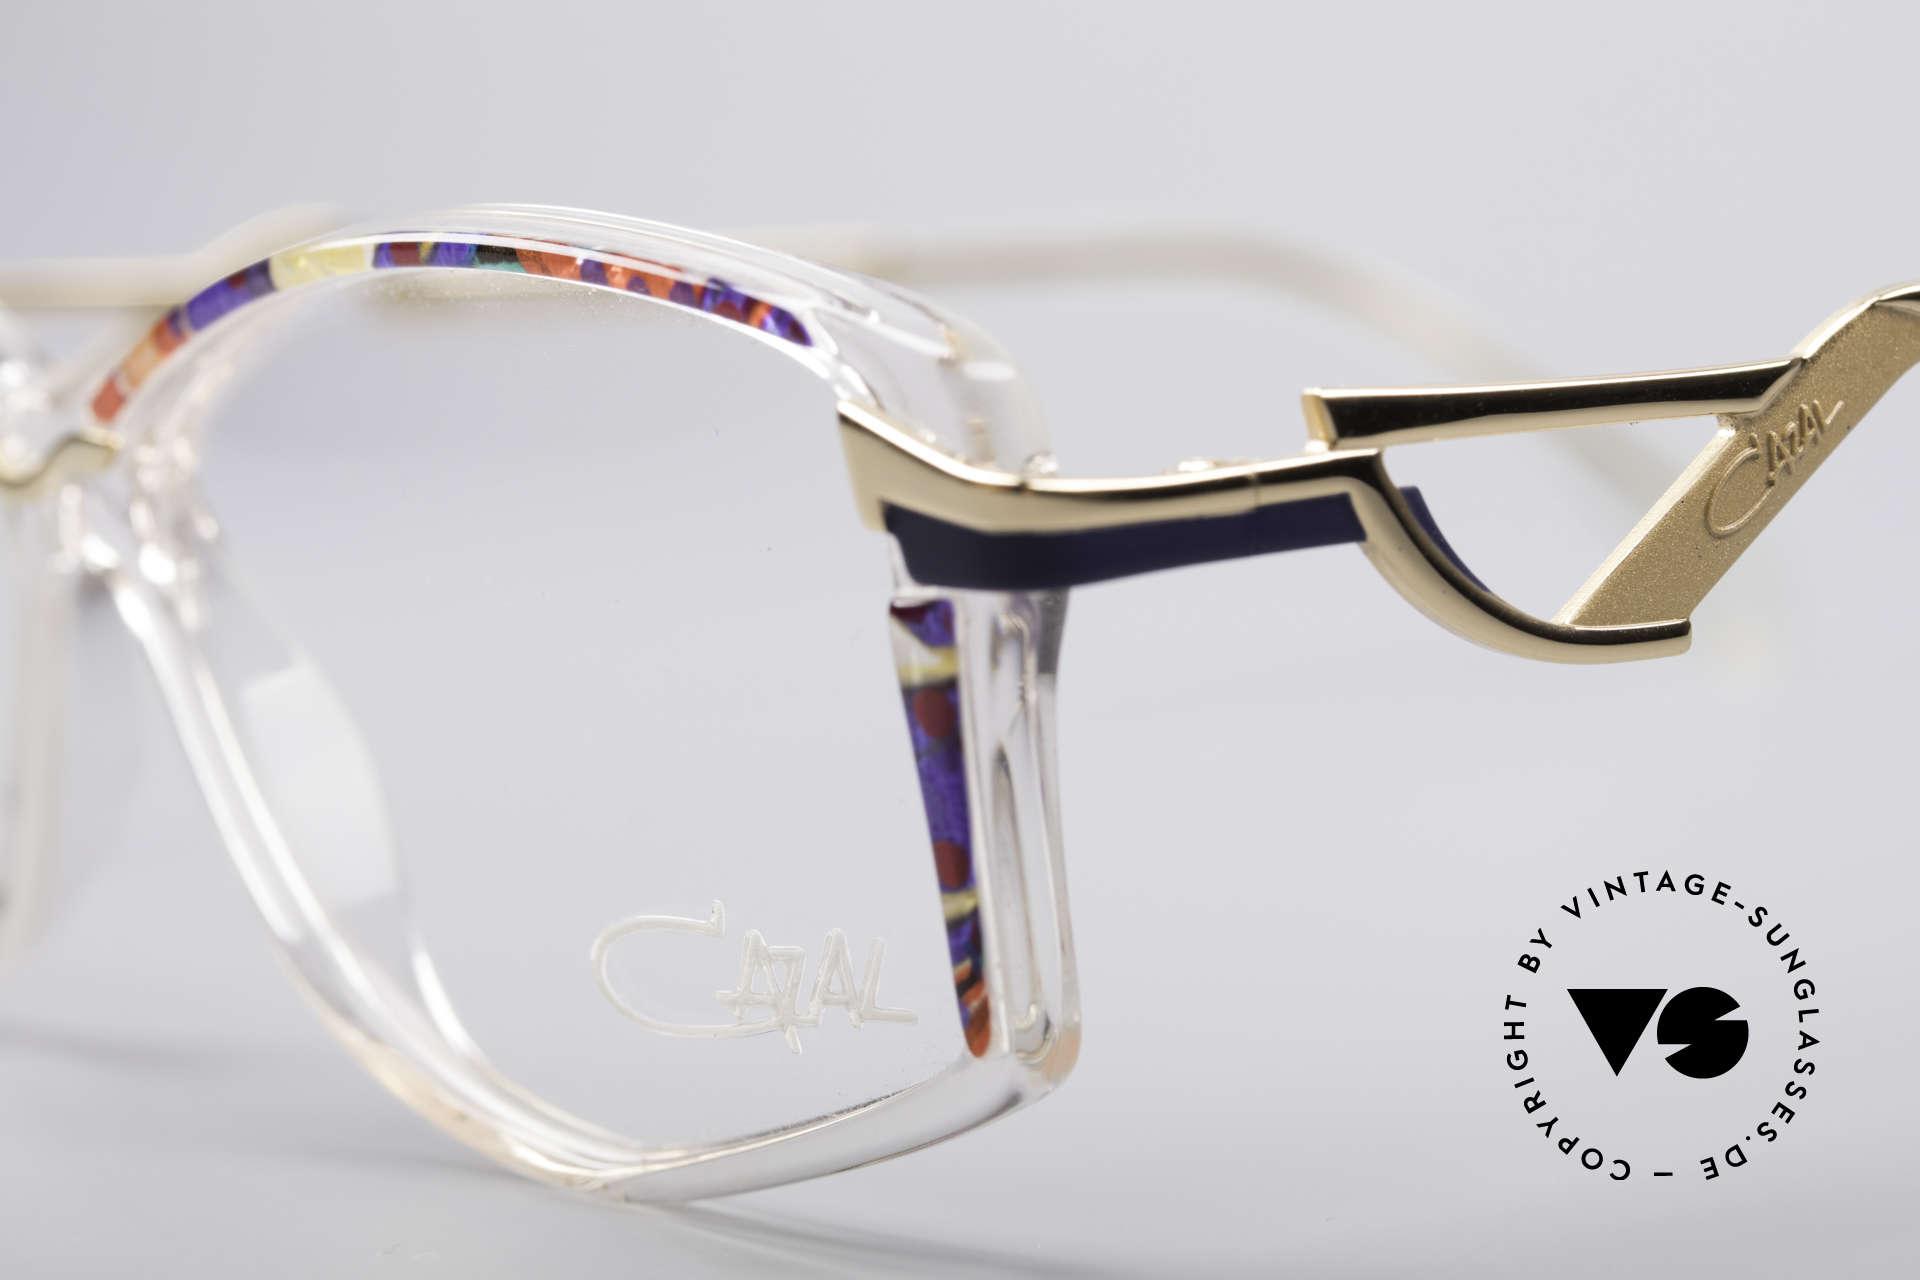 Cazal 369 90's Vintage No Retro Specs, official Cazal col. code 813: crystal / multicolor / gold, Made for Women